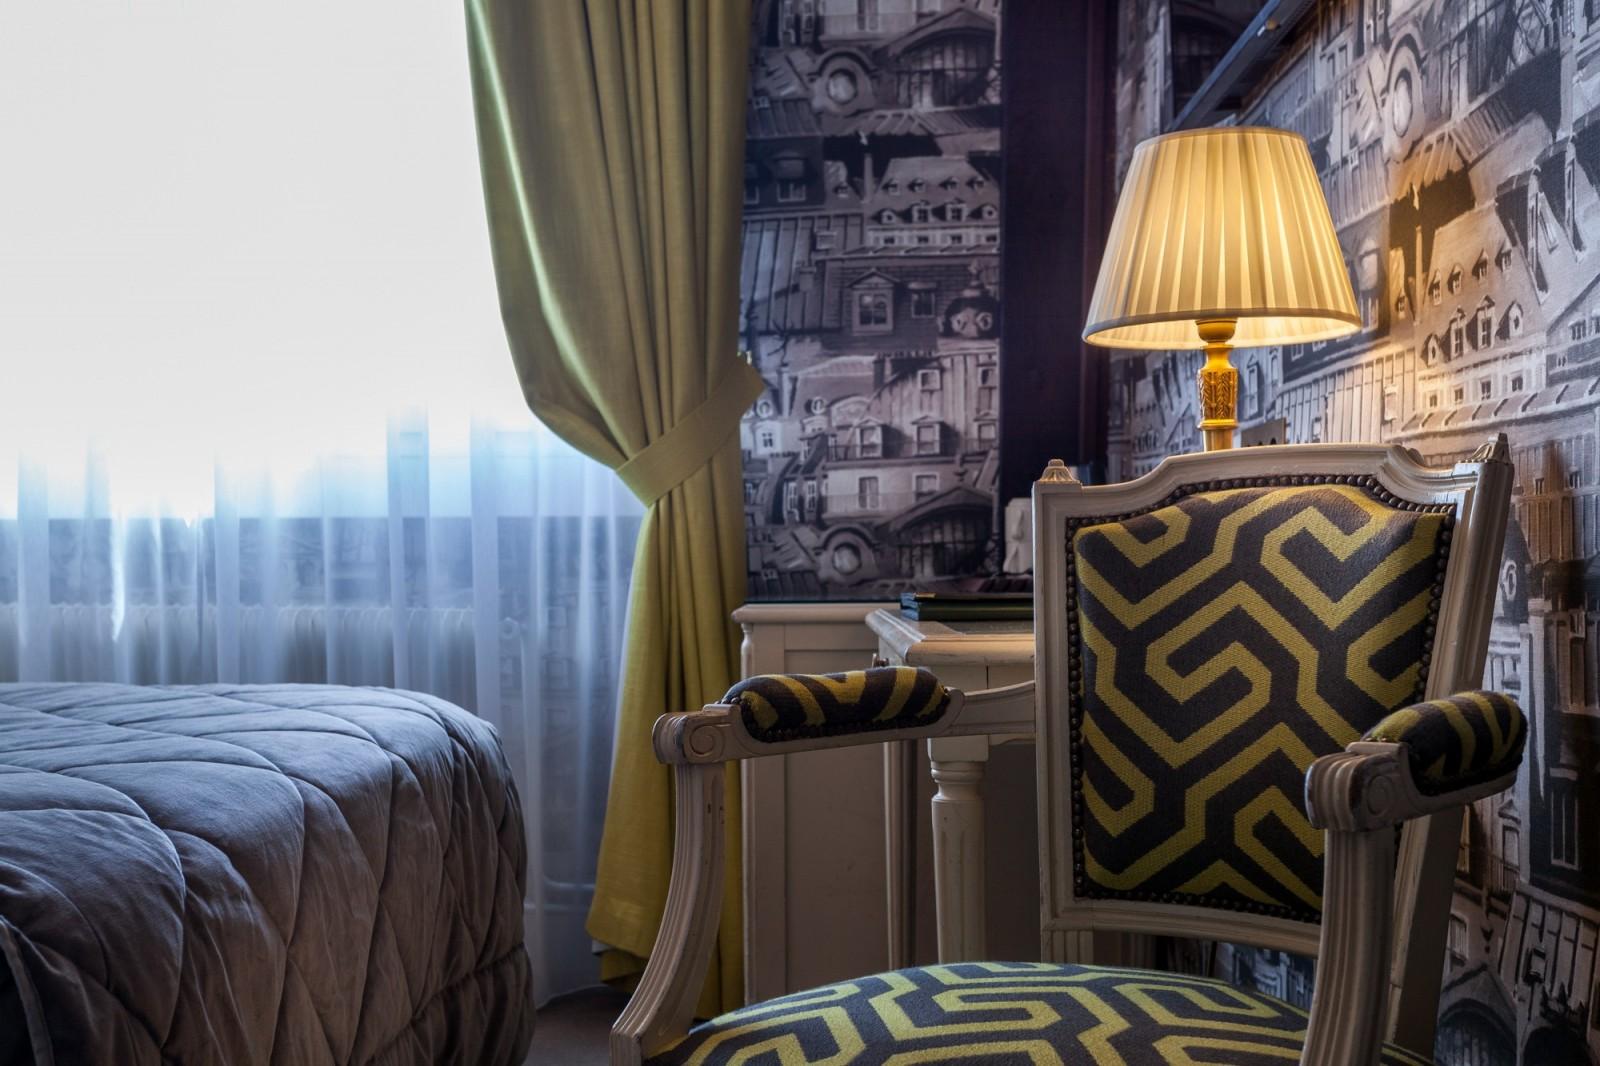 grand hotel de l 39 univers official site photos gallery. Black Bedroom Furniture Sets. Home Design Ideas